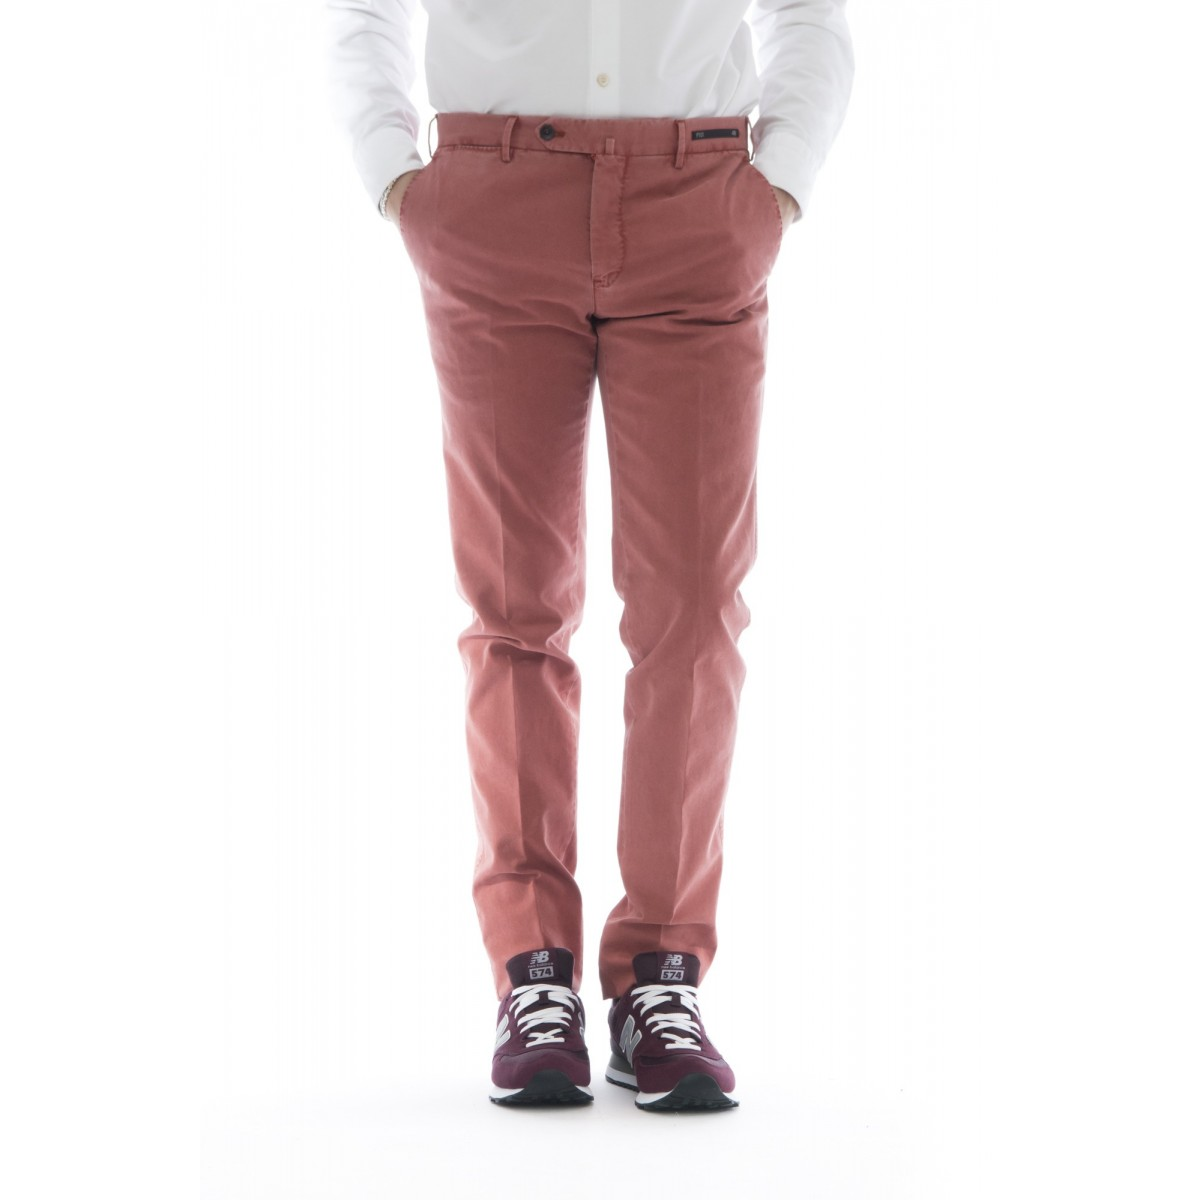 Pantalone uomo - Cpdl01z00spr super slim cotone lavato strech